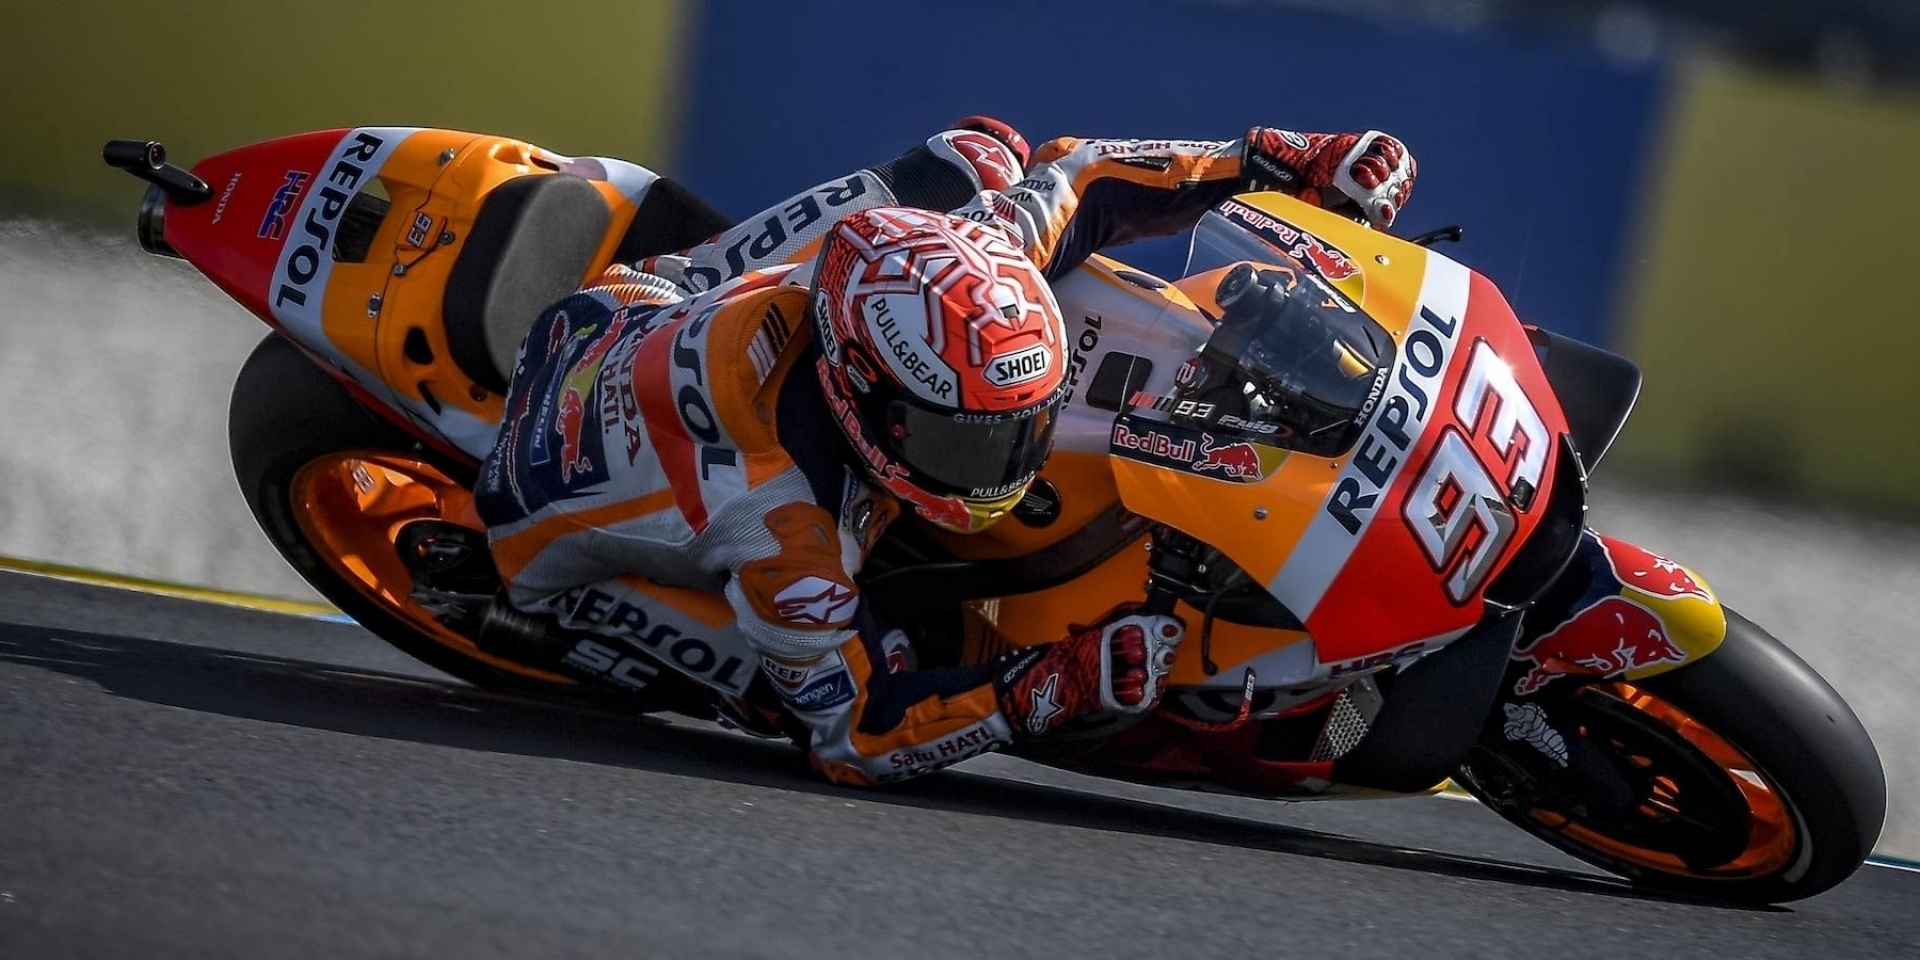 MotoGP超級比一比,Marc Marquez真的比前輩們還要厲害嗎?